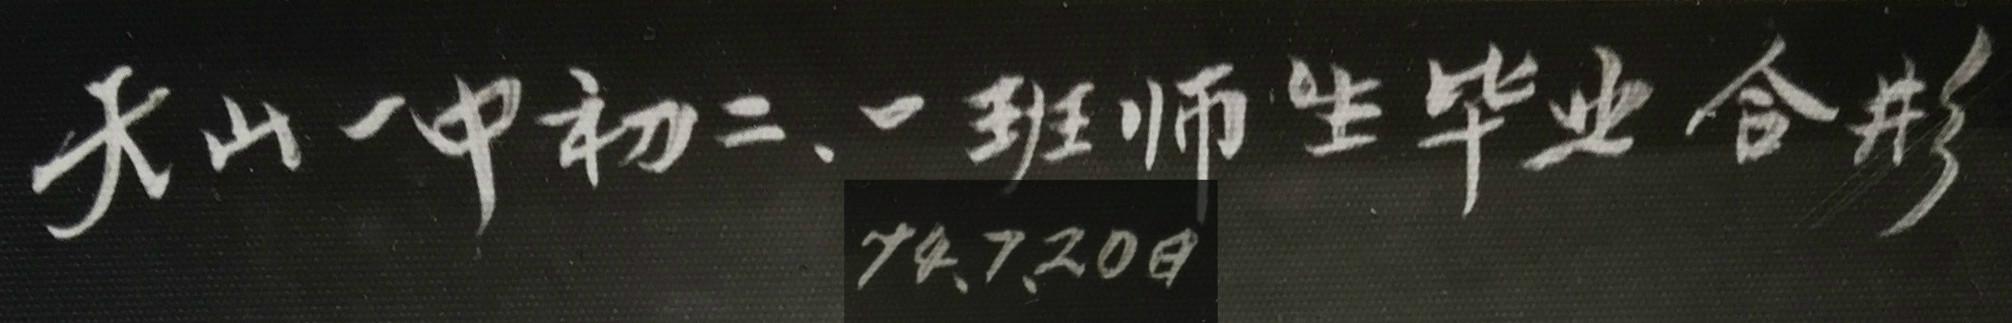 y-英存 banner